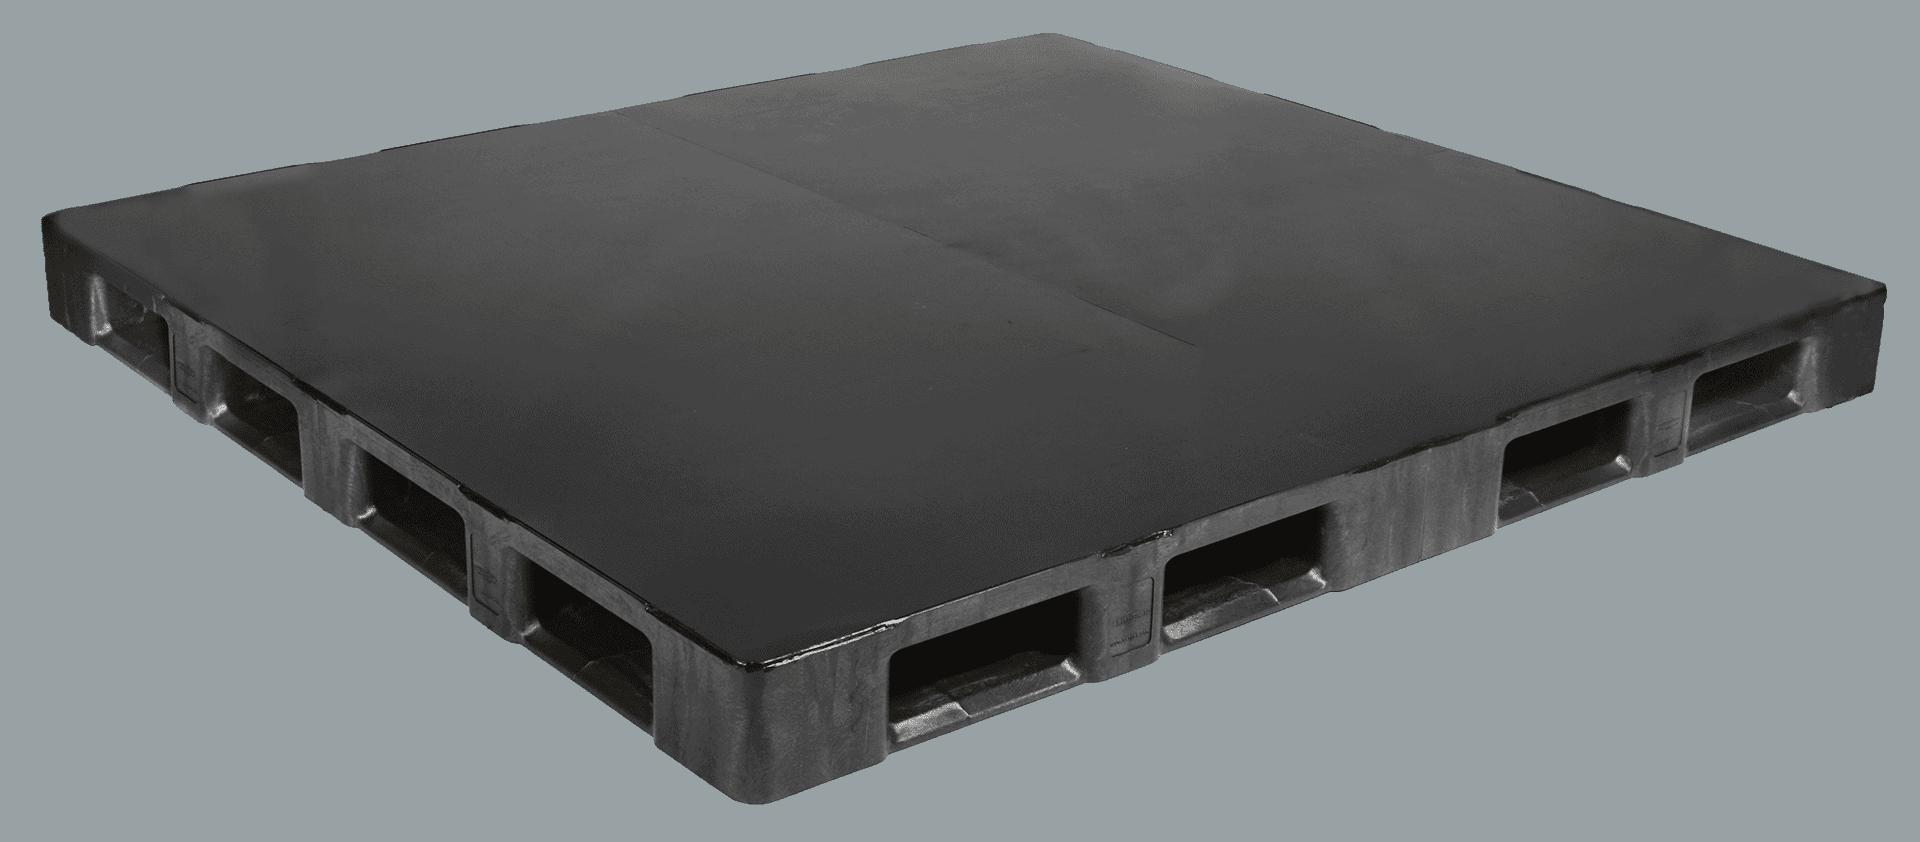 87x80 Reusable Pallet